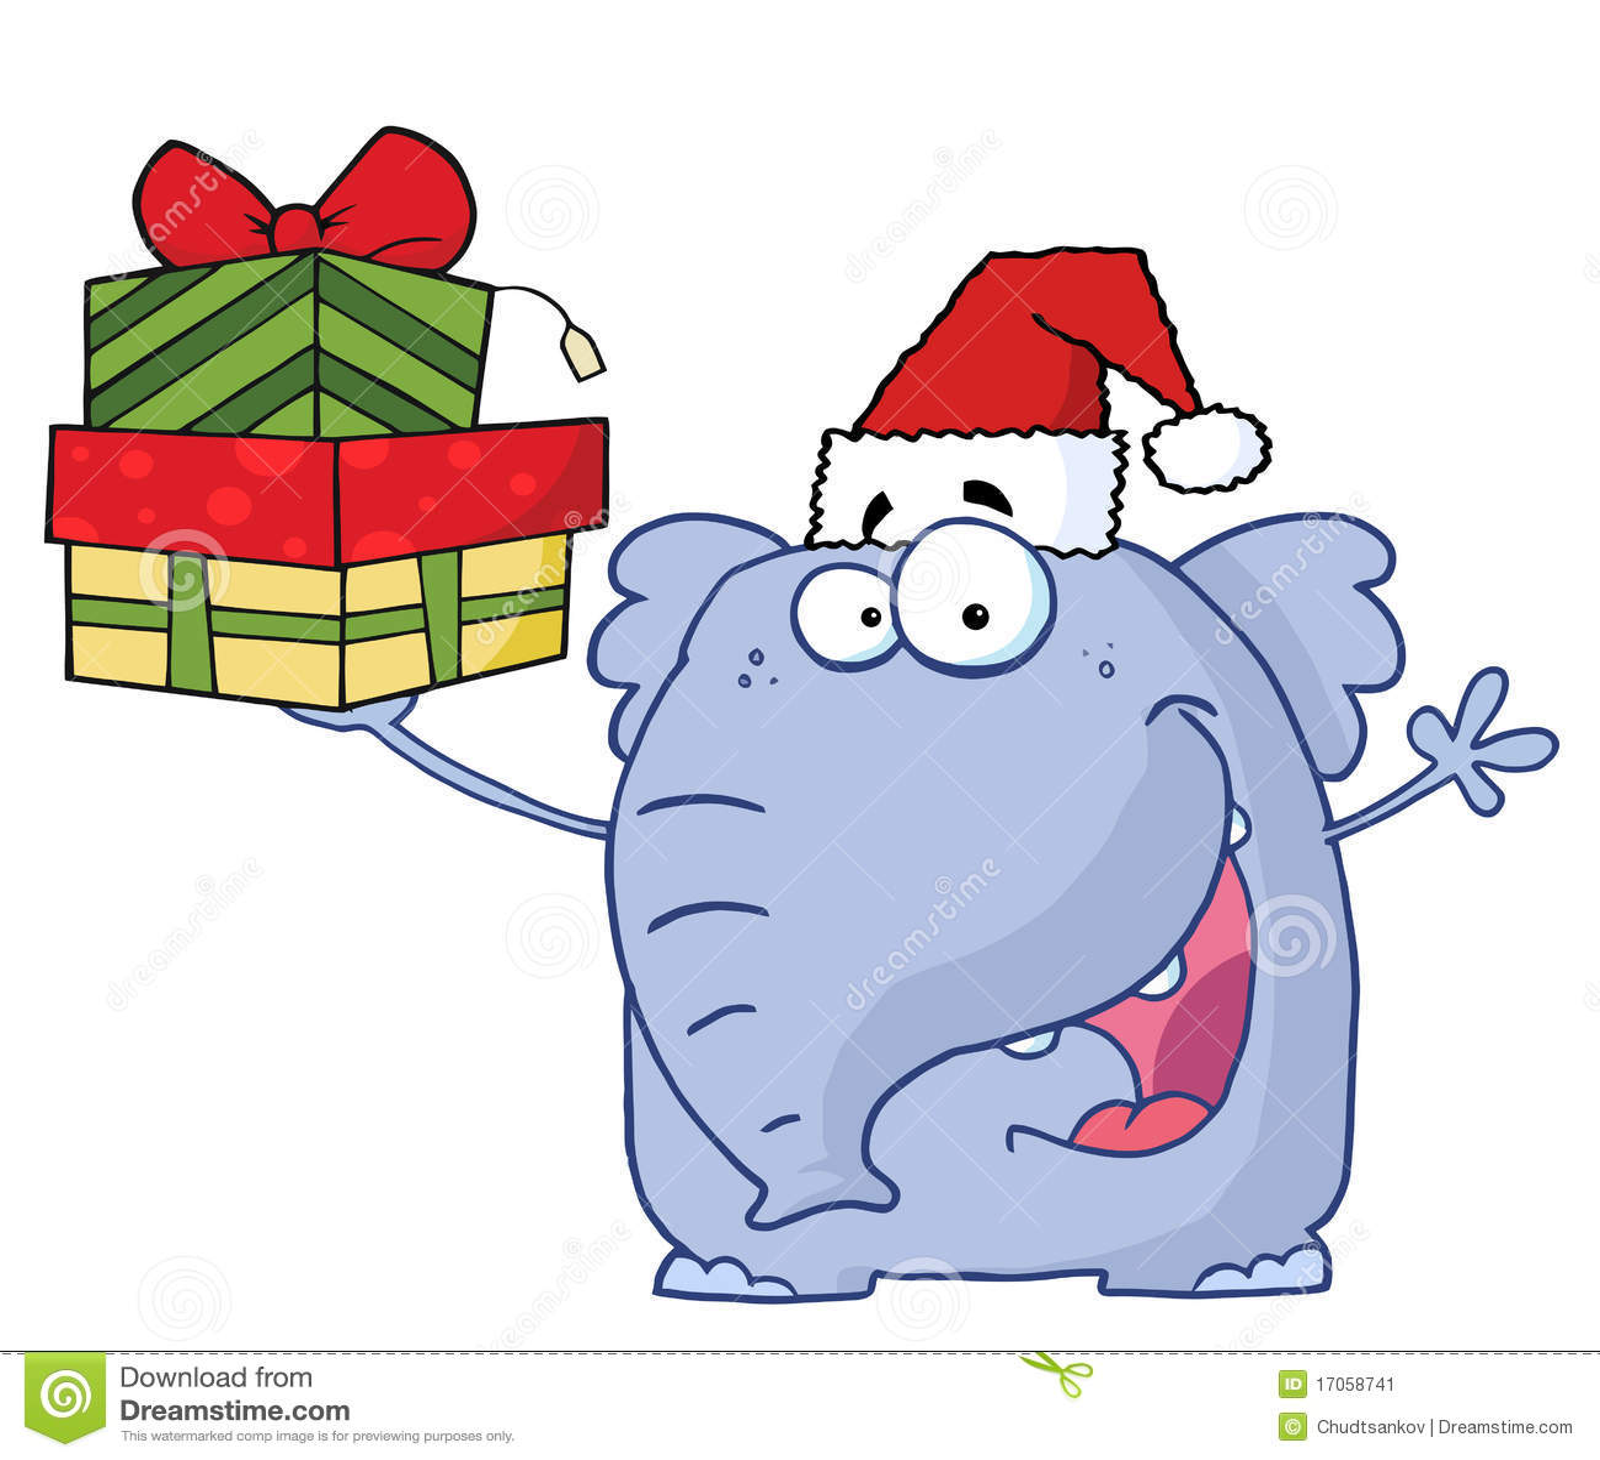 white elephant gift clipart free - photo #44